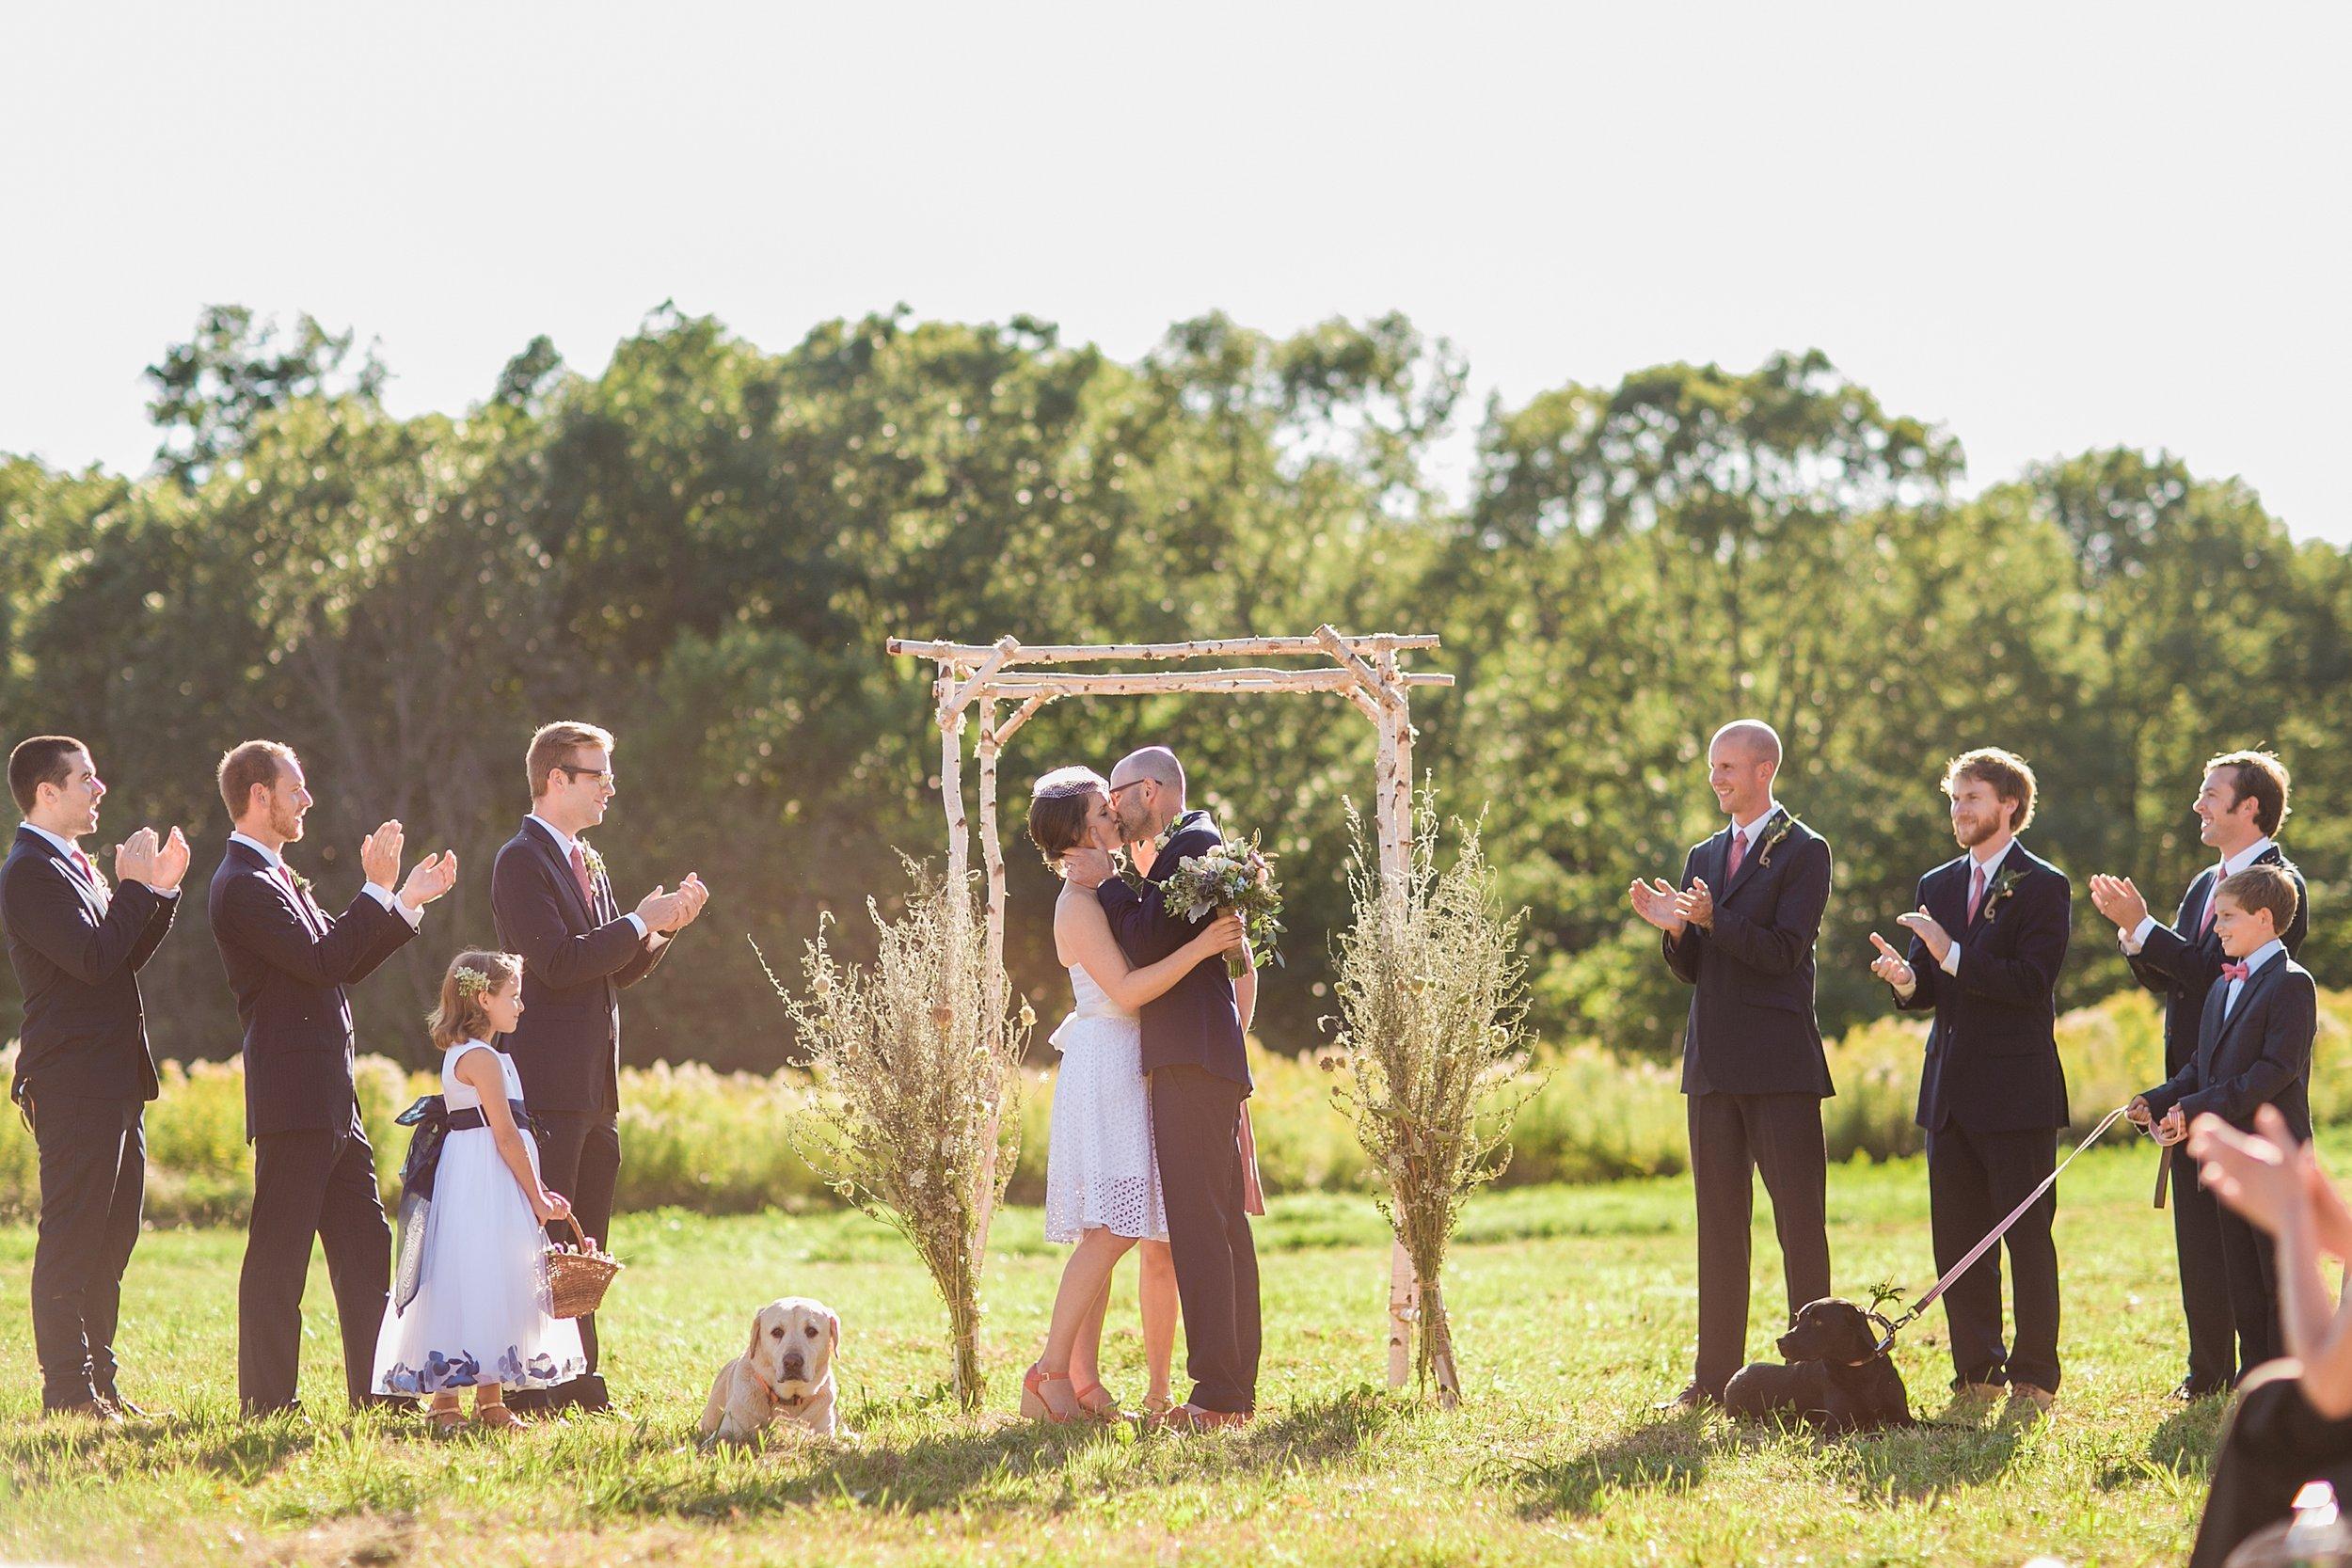 047 los angeles wedding photographer.jpg